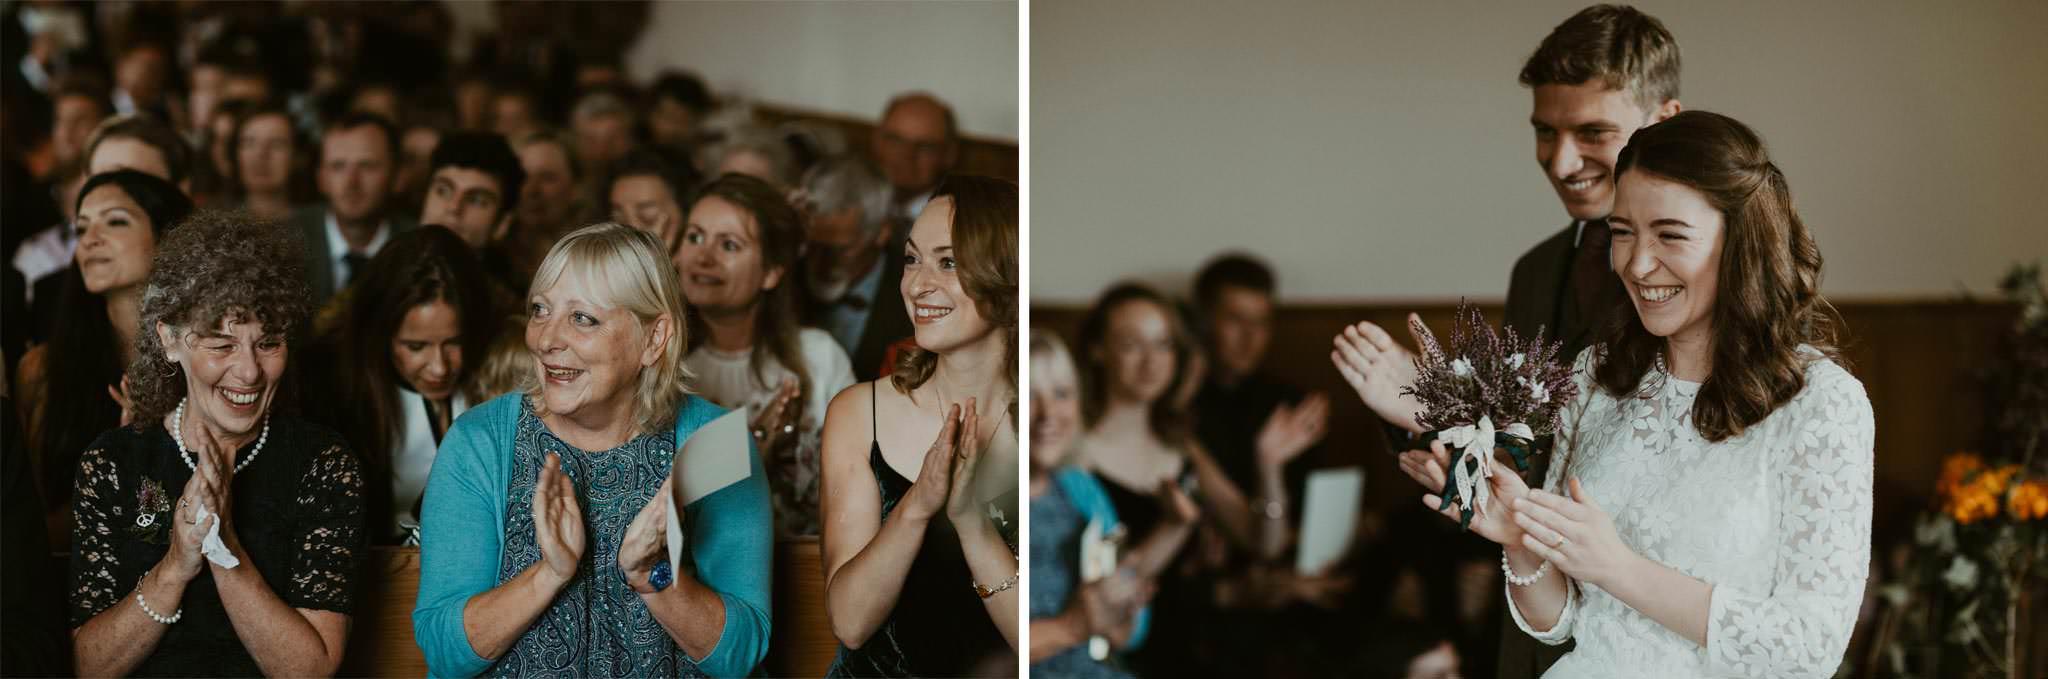 scotland-wedding-photographer-086